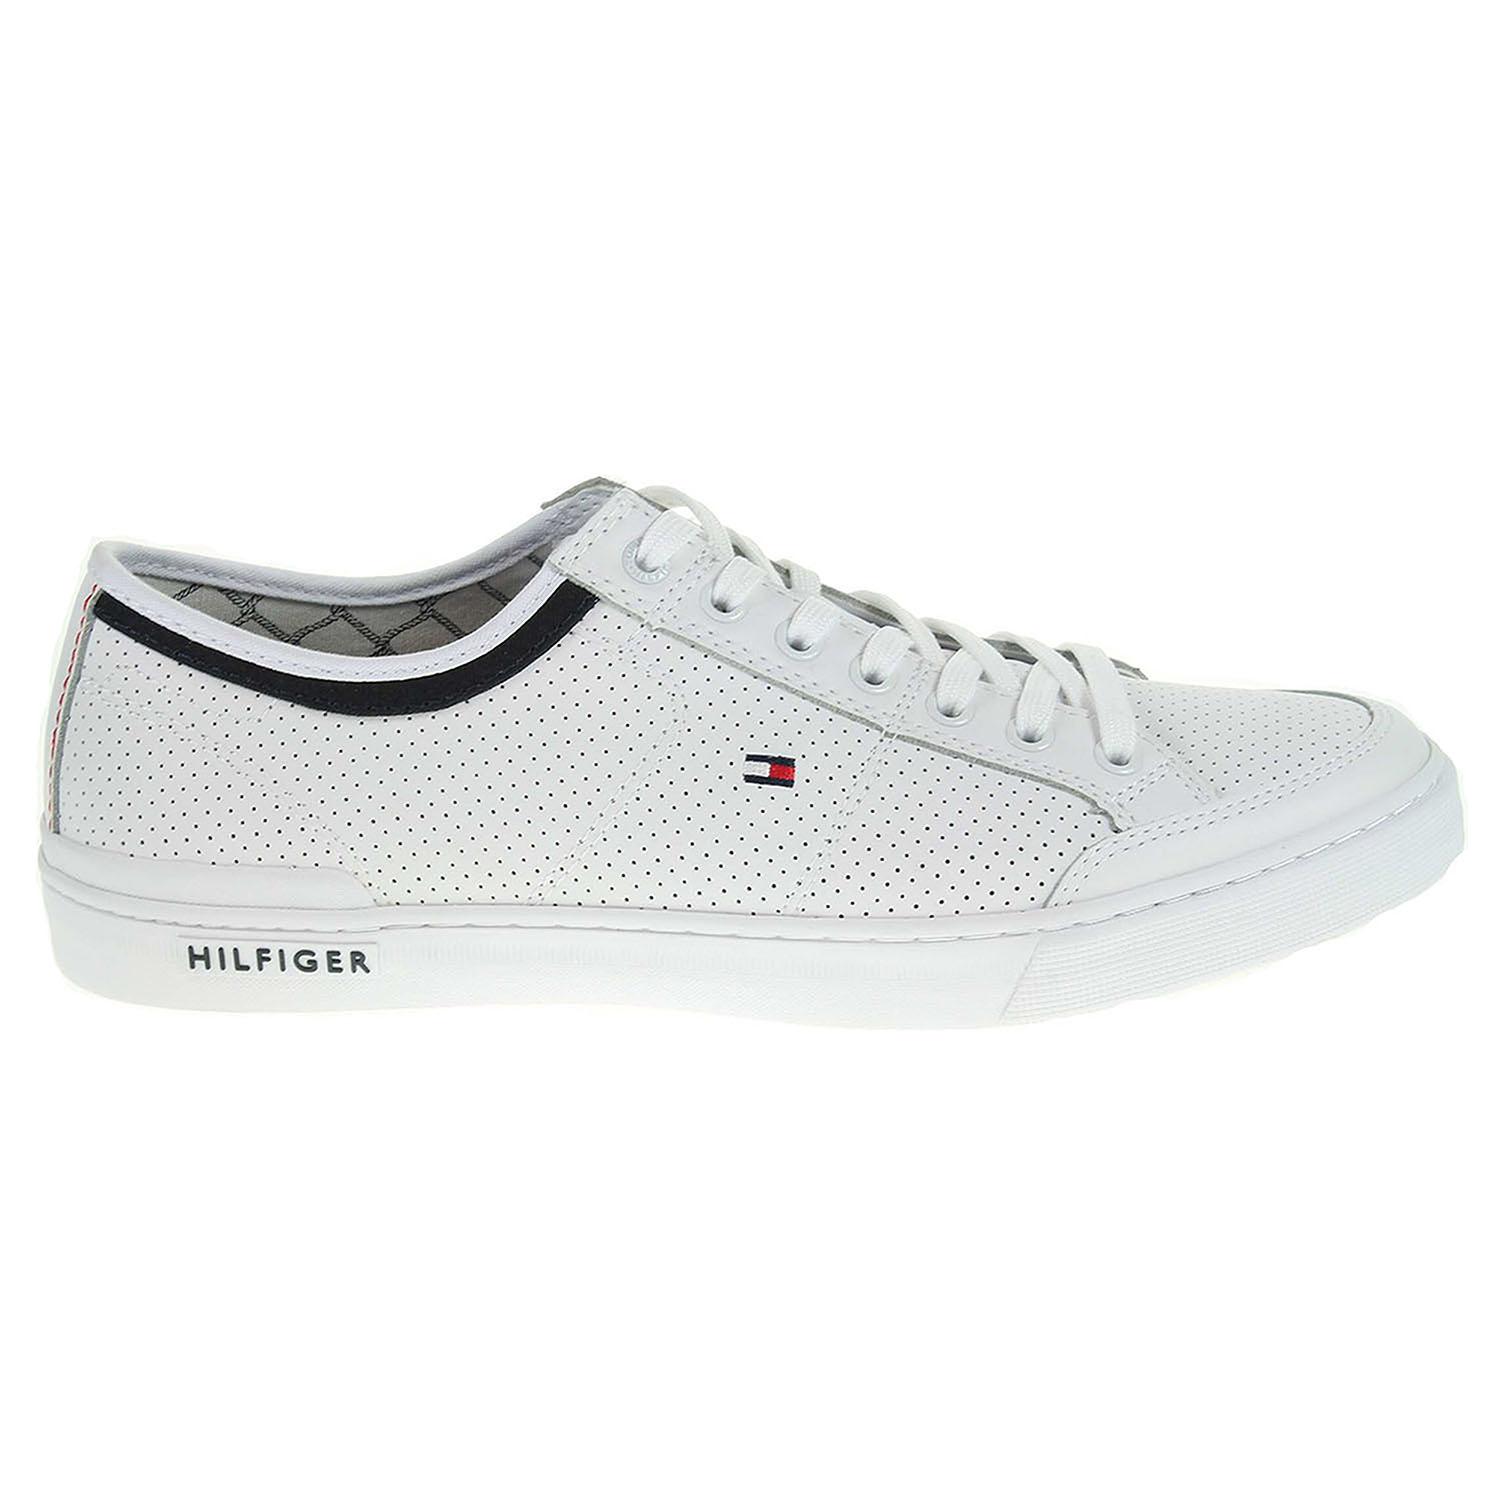 Ecco Tommy Hilfiger pánská obuv FM0FM00552 H2285ARRINGTON 5A bílá 24000446